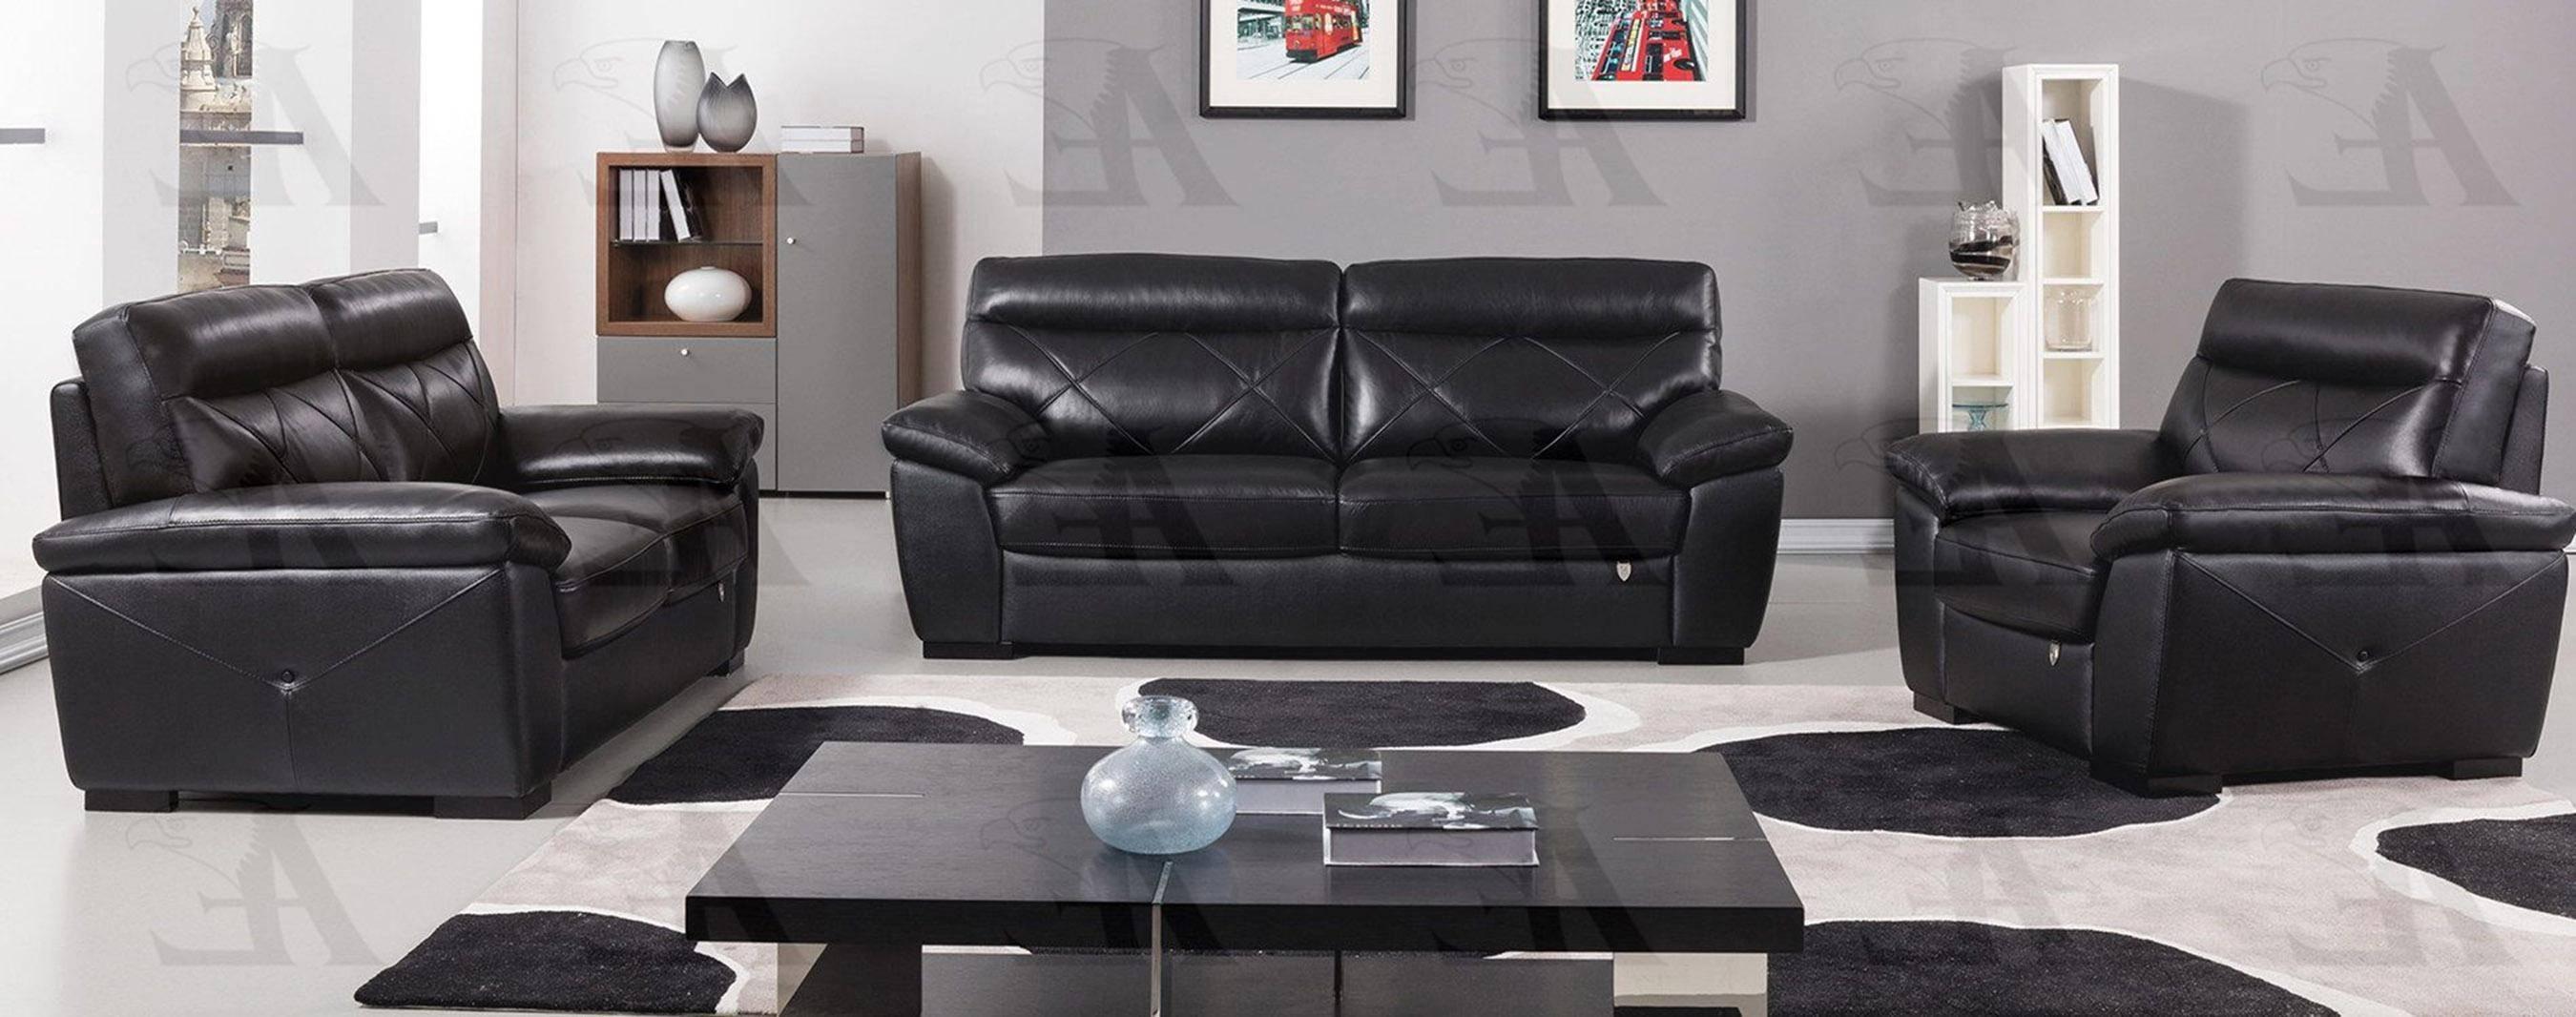 Buy American Eagle EK081 BK Sofa Loveseat and Chair Set 3 Pcs in